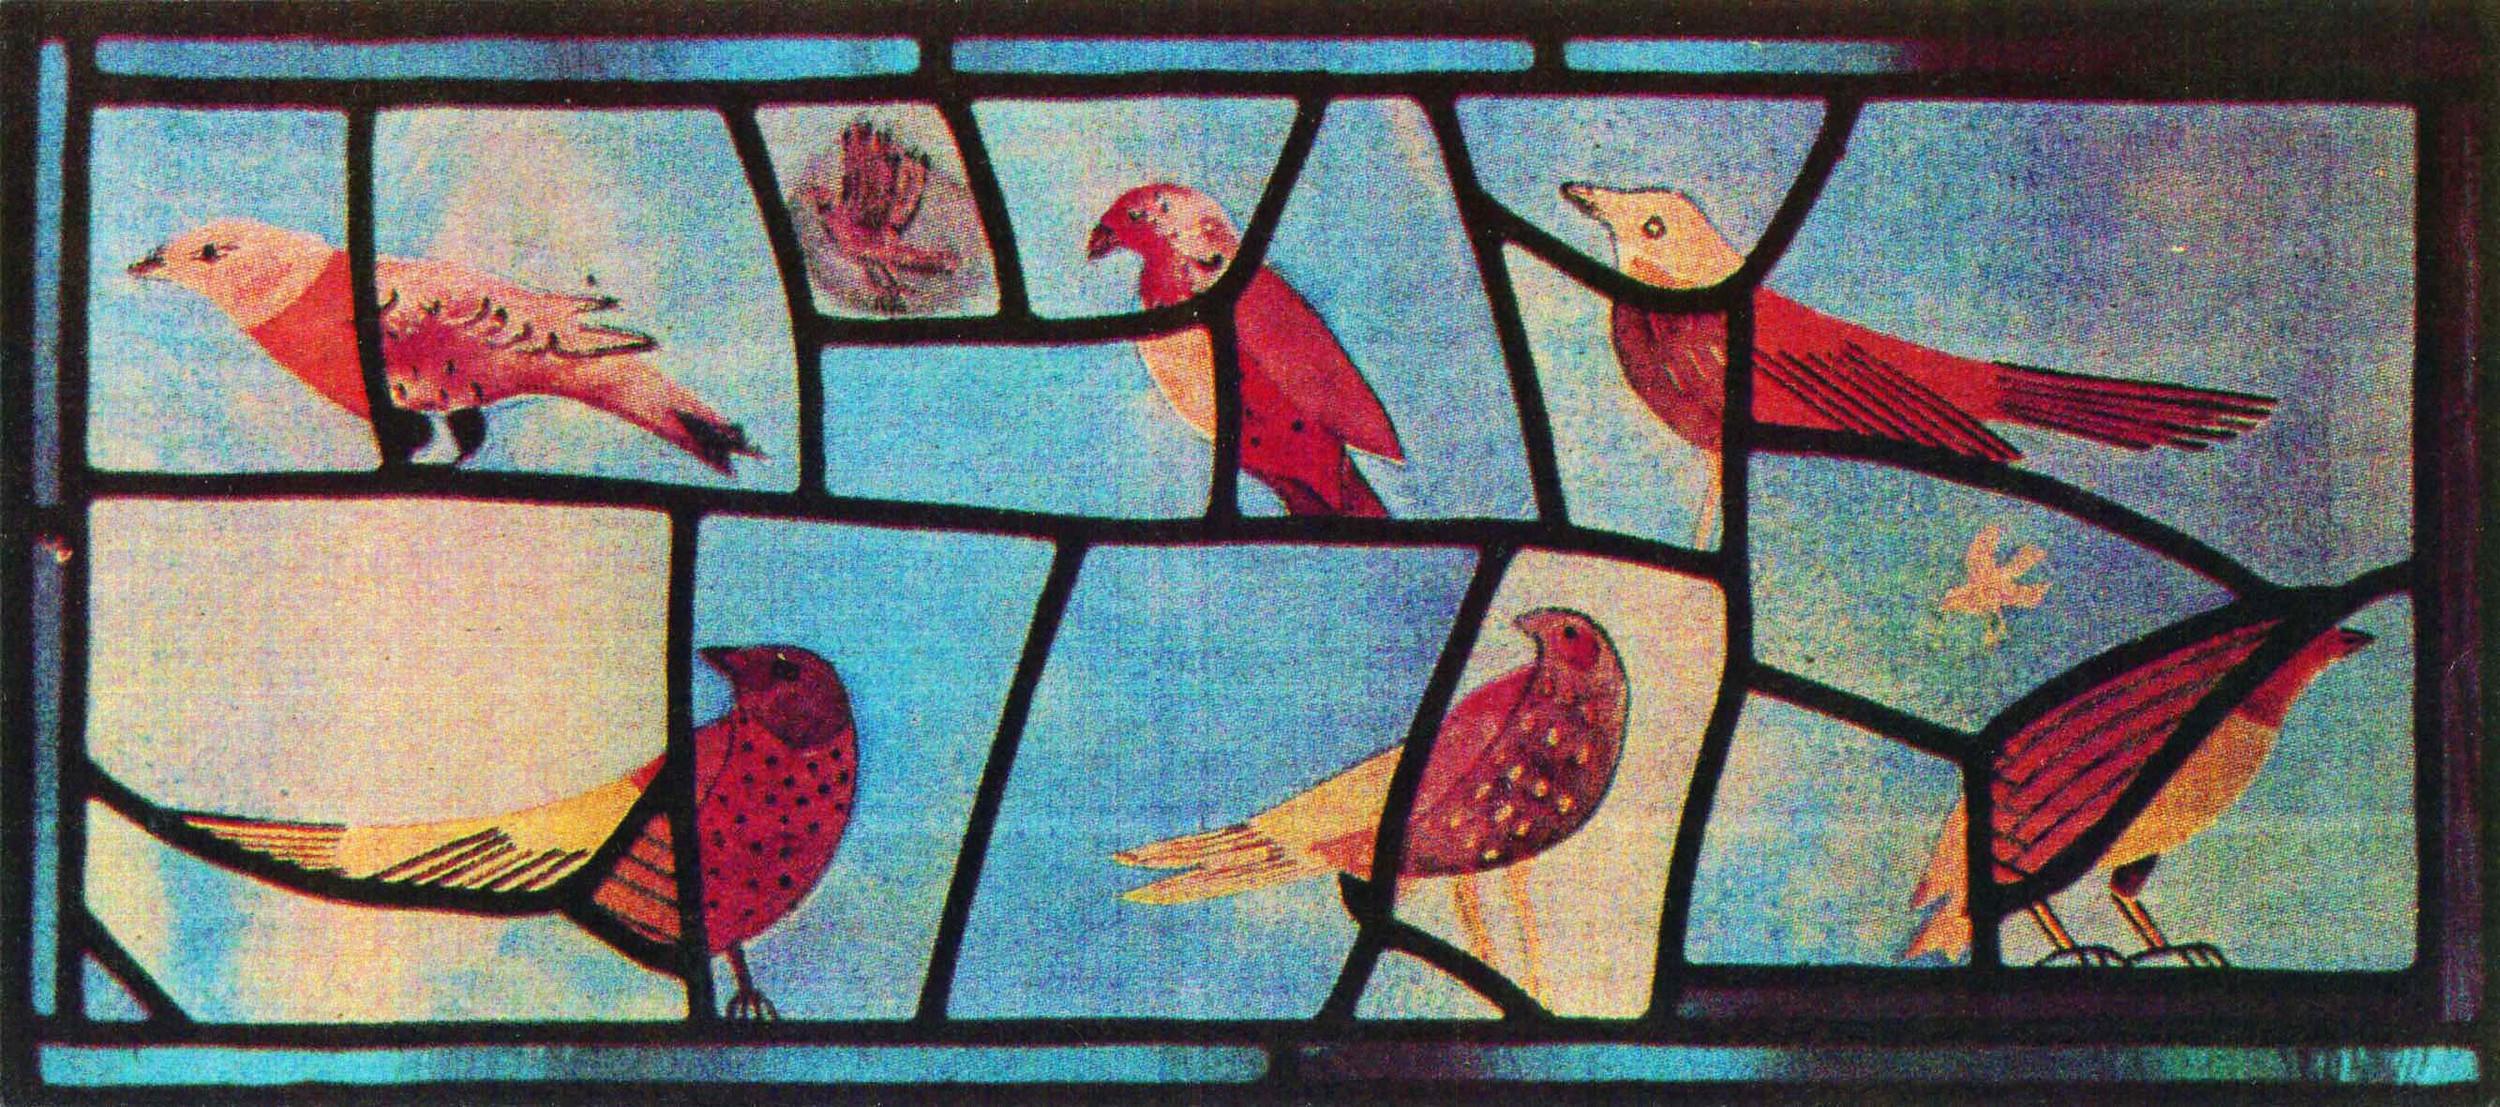 My bird window, 1986